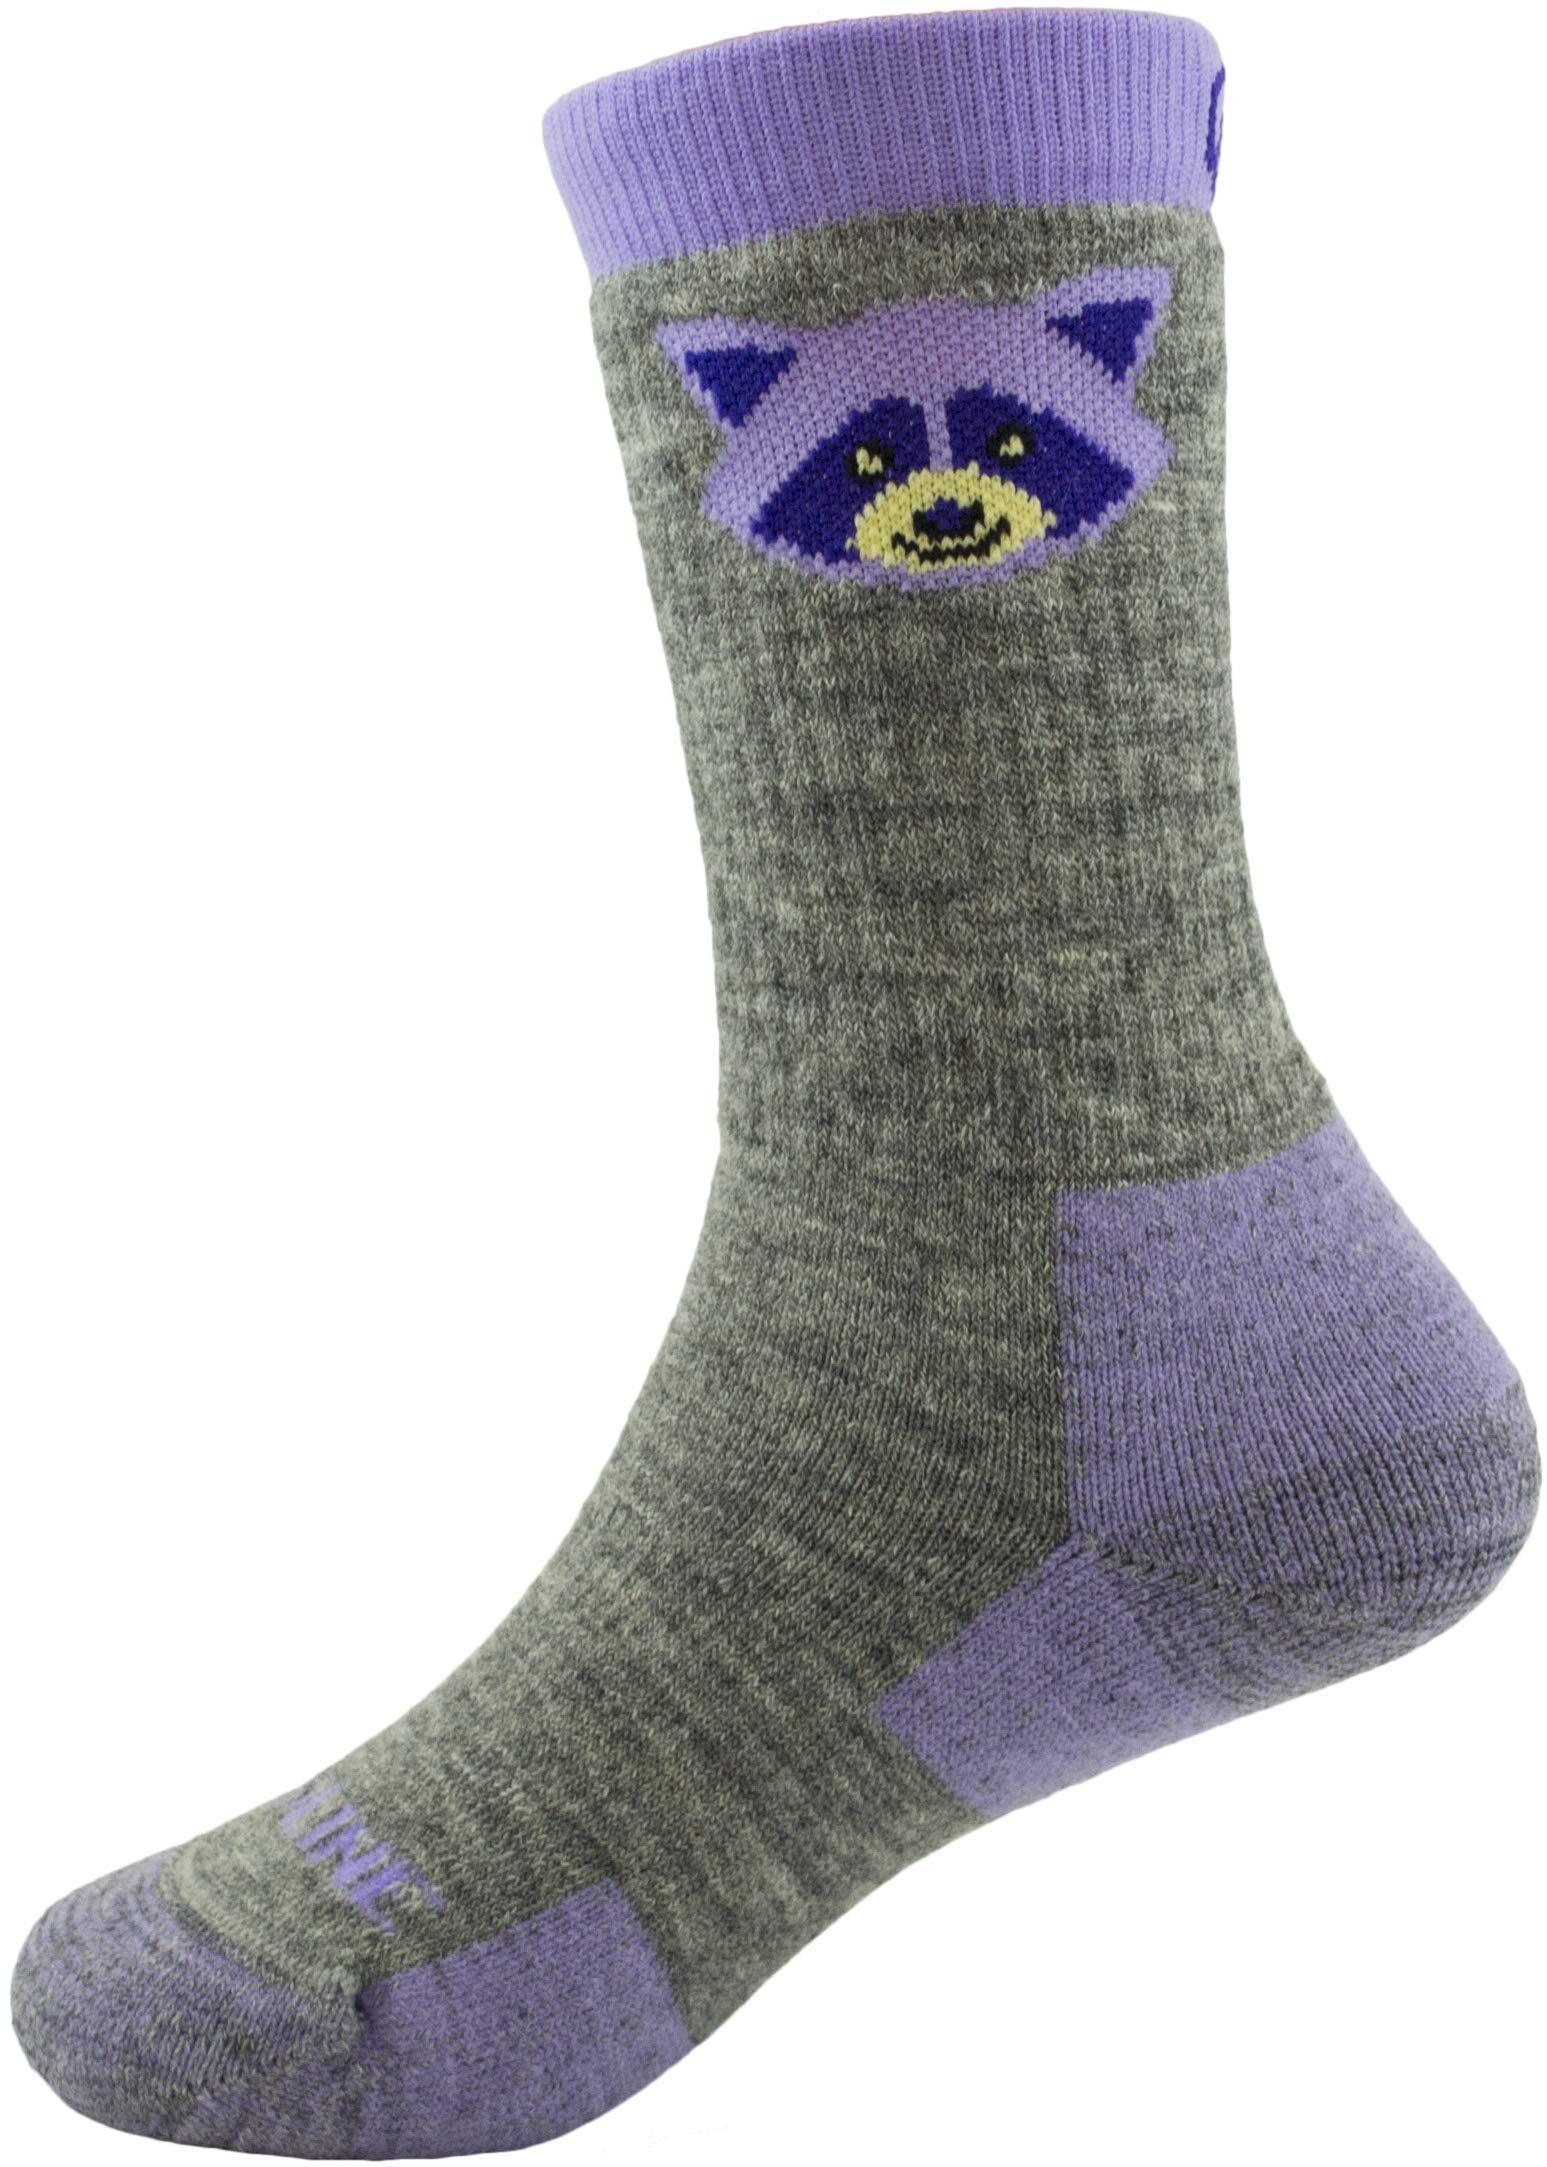 CloudLine Merino Wool Kid's Spirit Animal Socks - 2 Pack - Purple Racoon - Size Y-XS - Made in USA